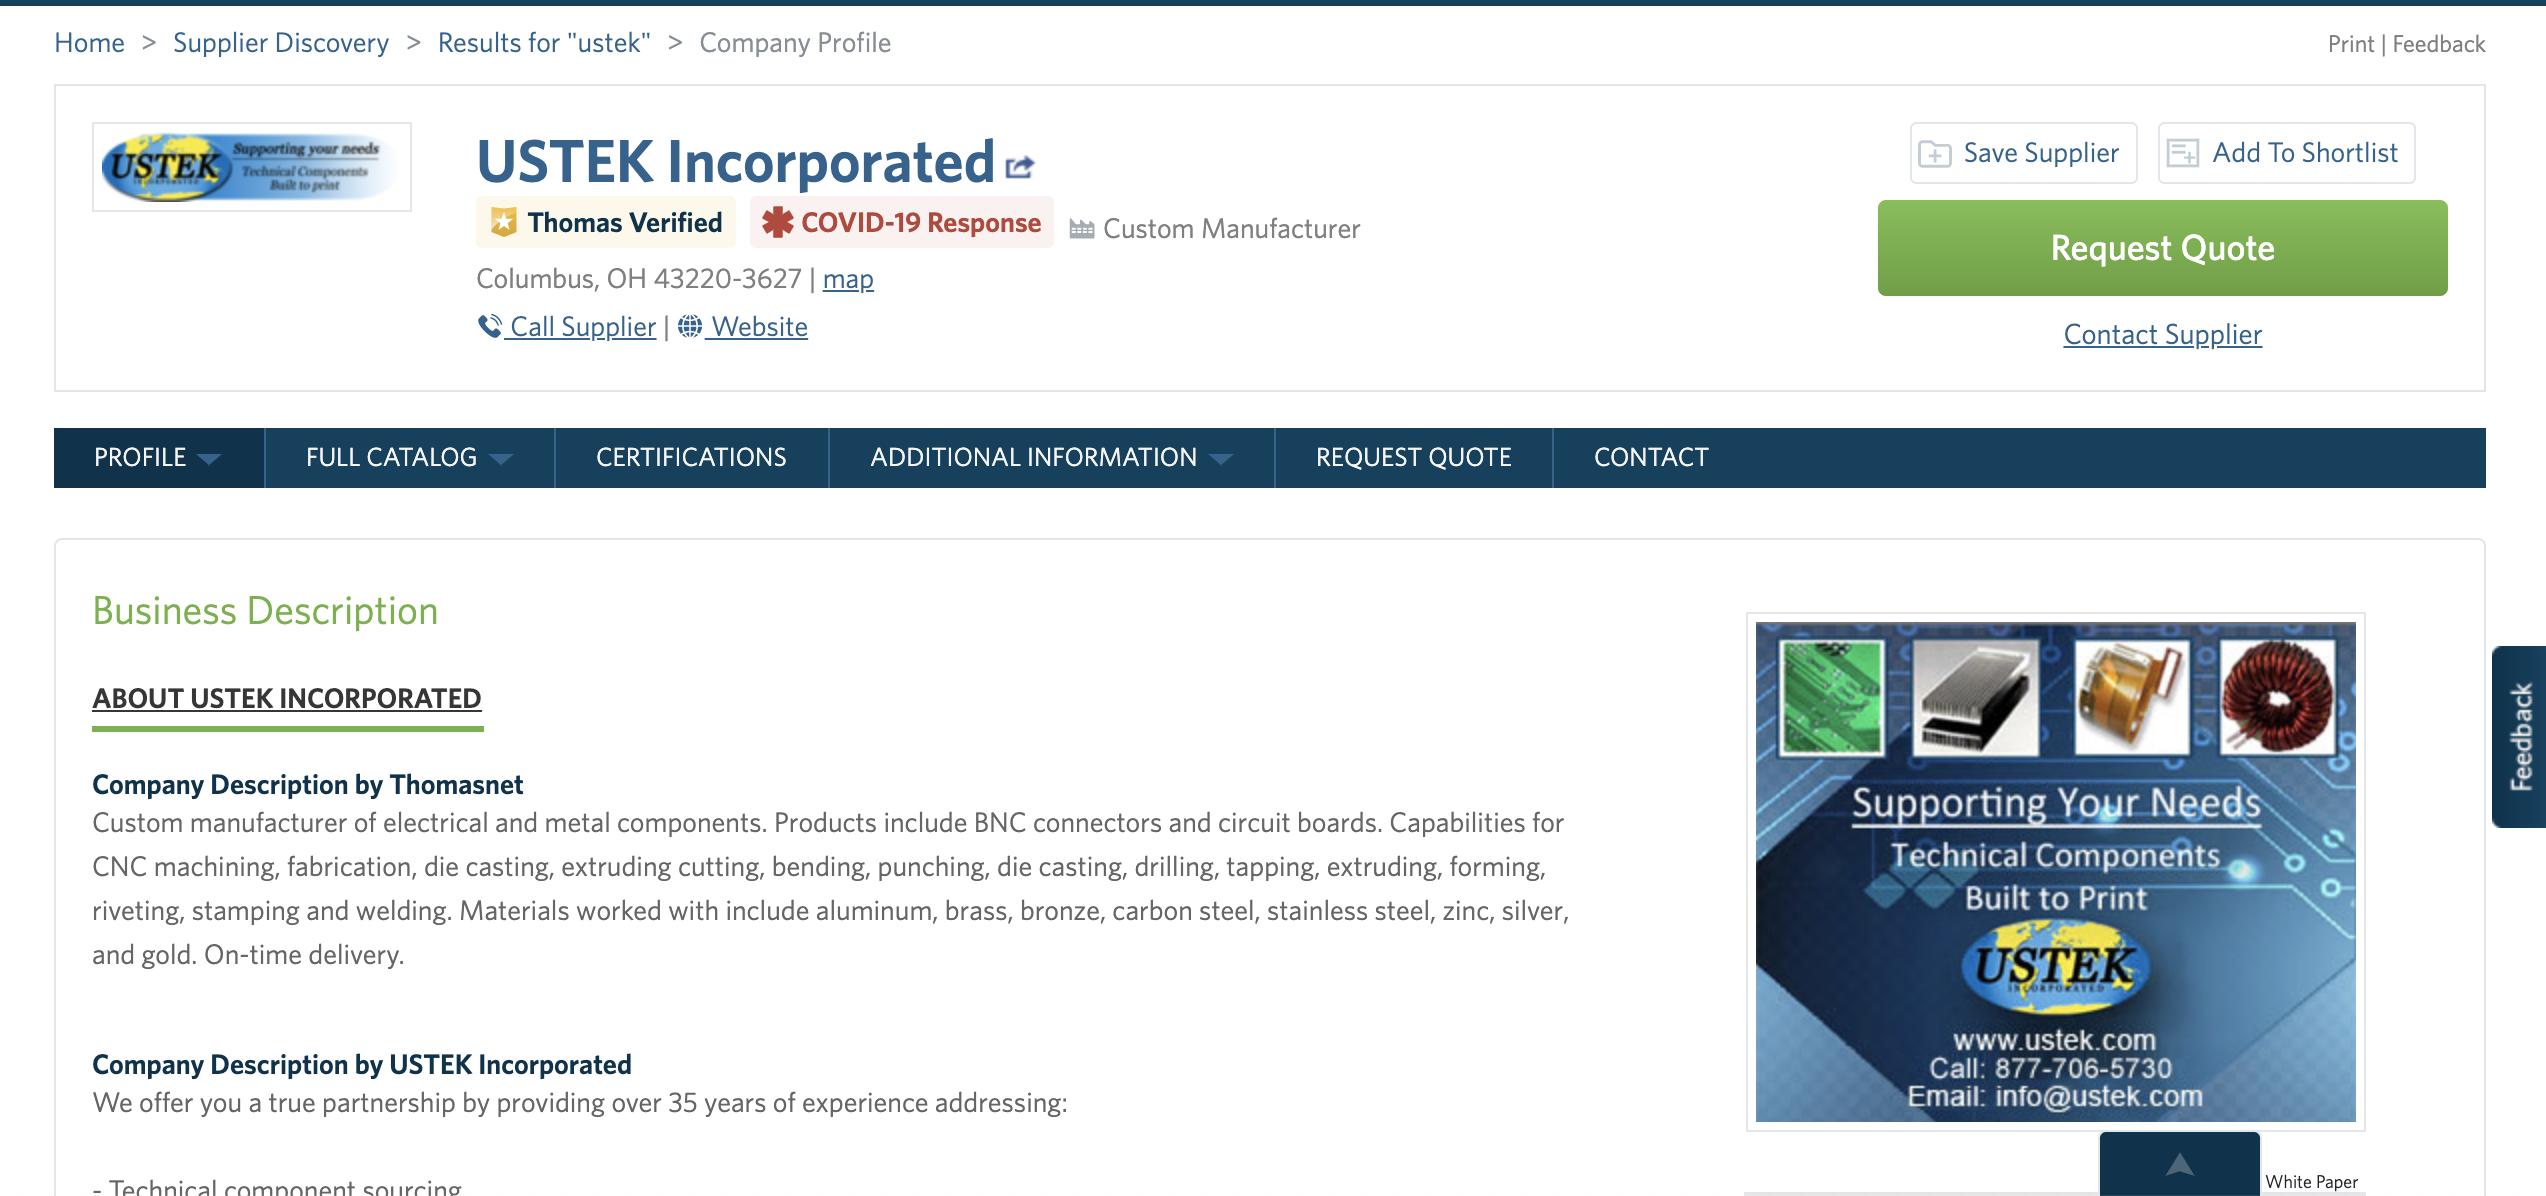 USTEK Incorporated Company Profile 2020